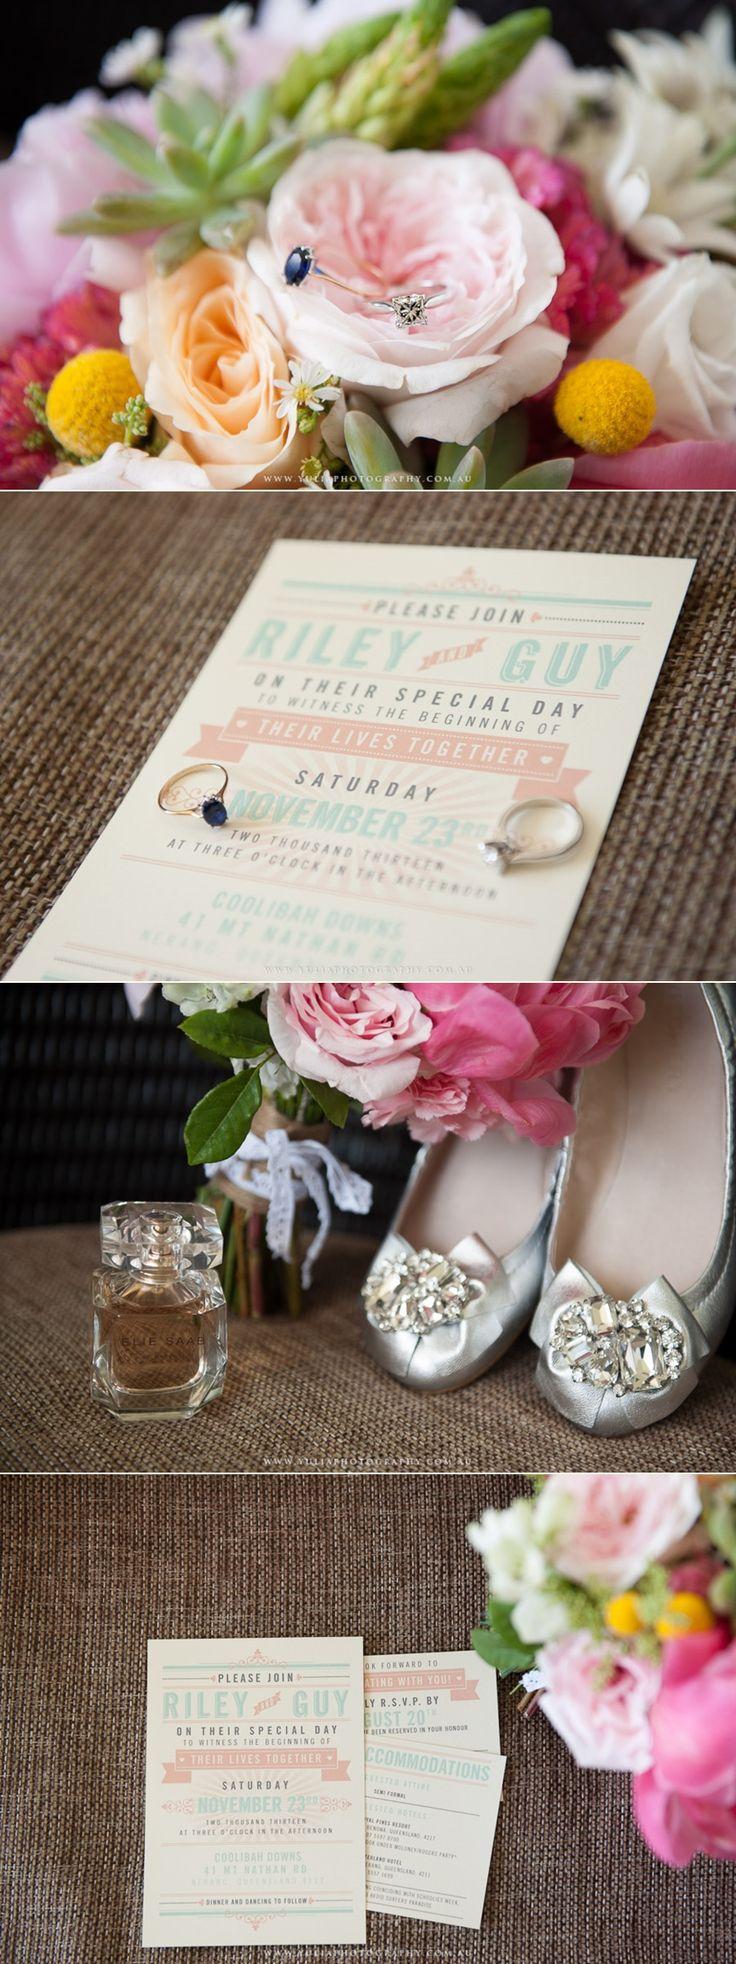 Vintage Inspired Wedding Invitations. Vintage wedding ideas.  ~Sydney wedding photography by Yulia Photography~ www.yuliaphotography.com.au